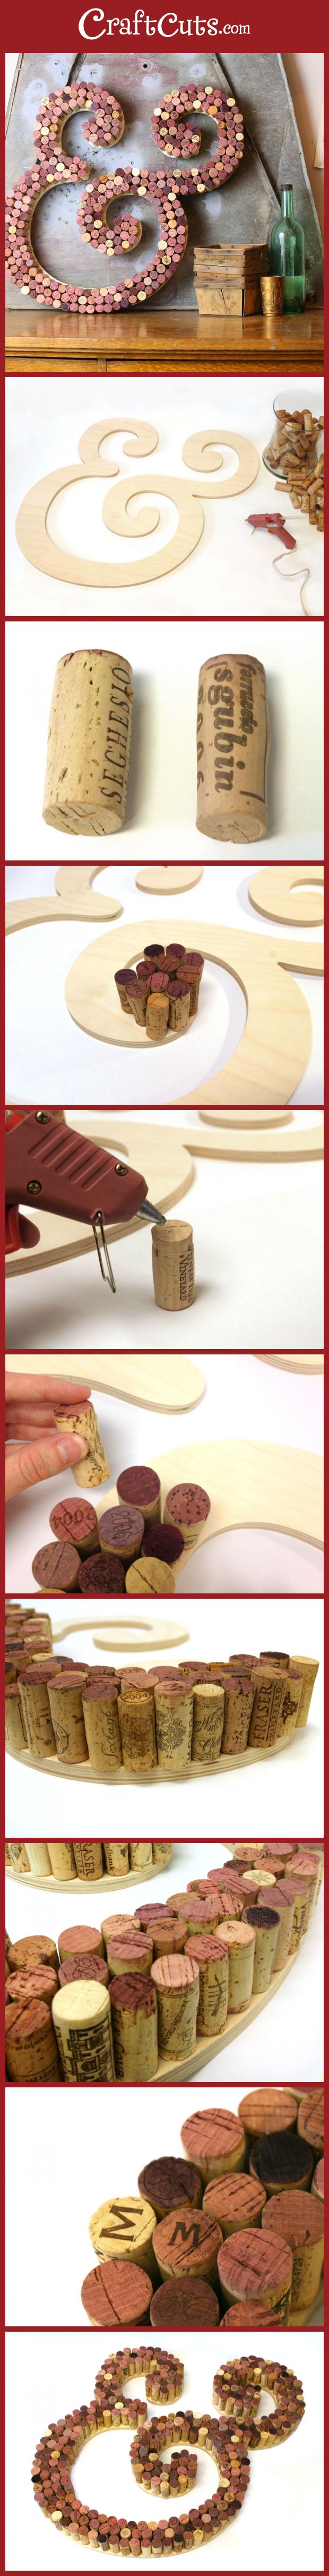 Wine cork craft kits - View Pintorial